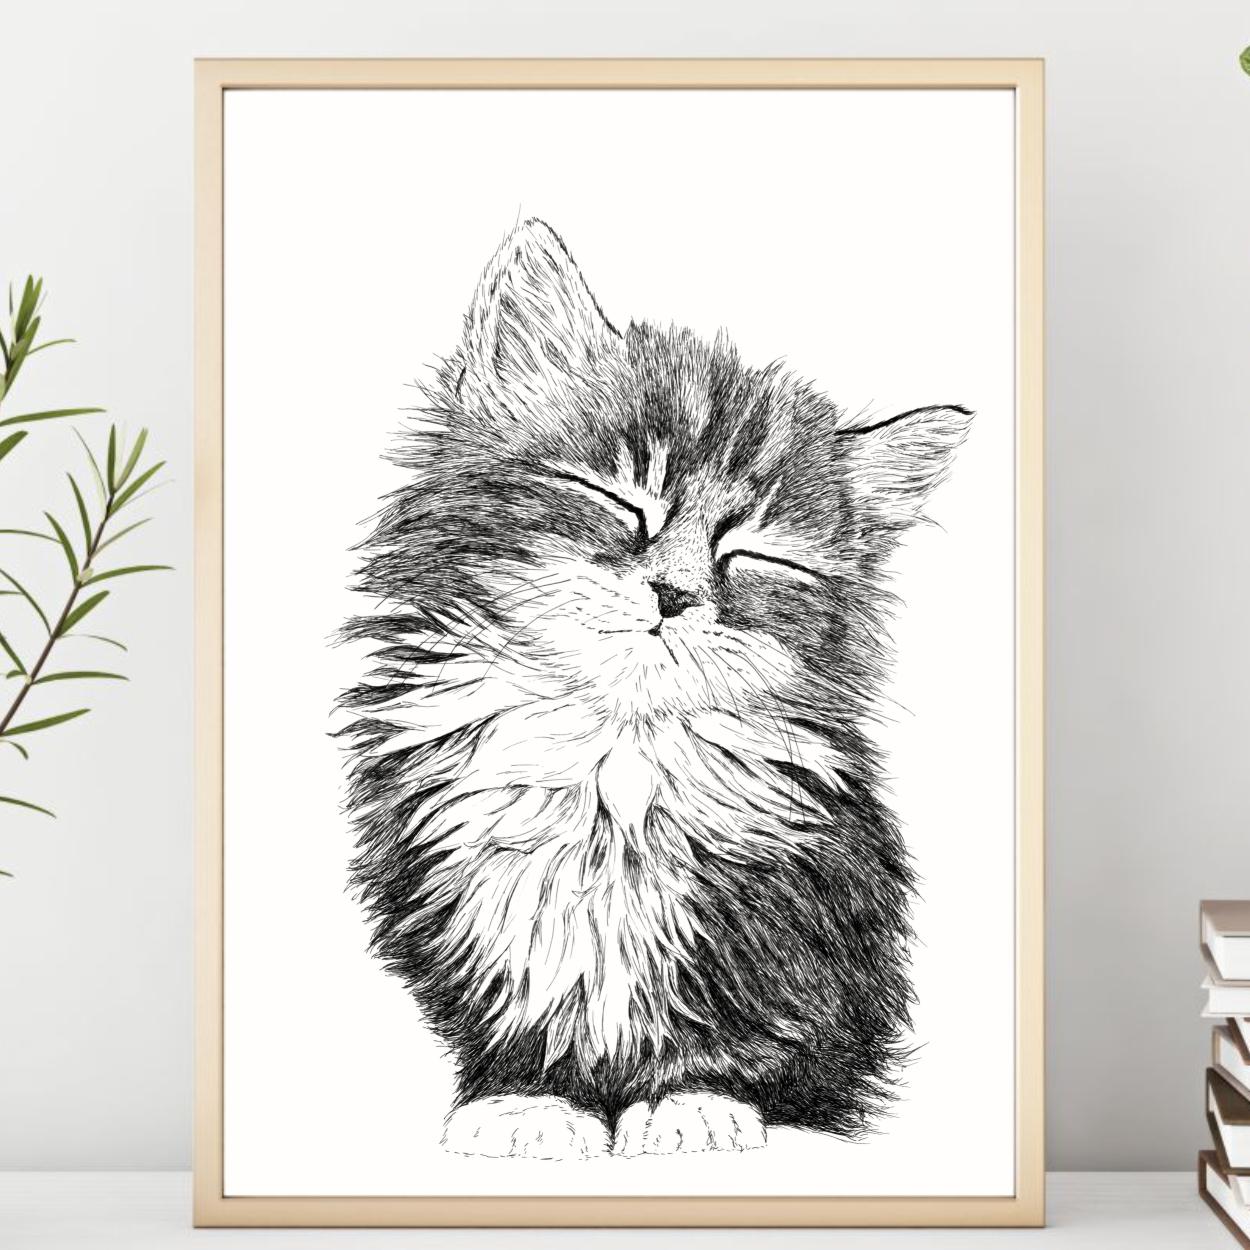 Plakat med sød kattekilling